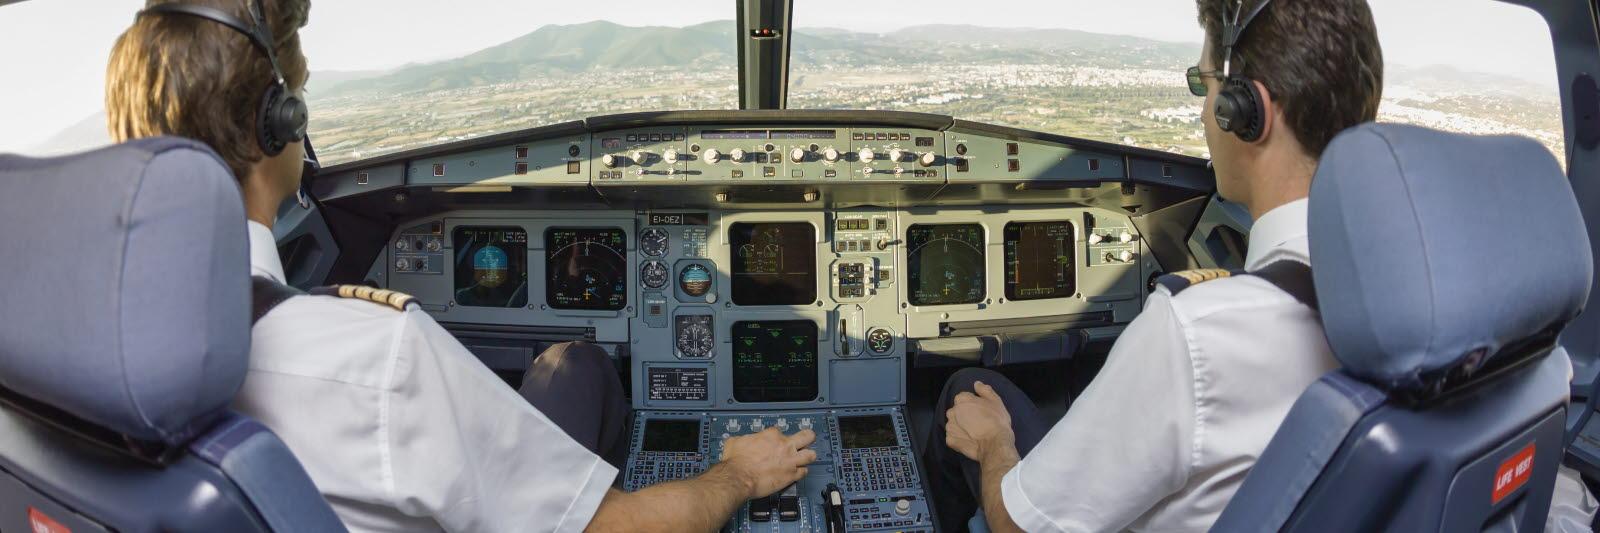 2 pilots flying a plane